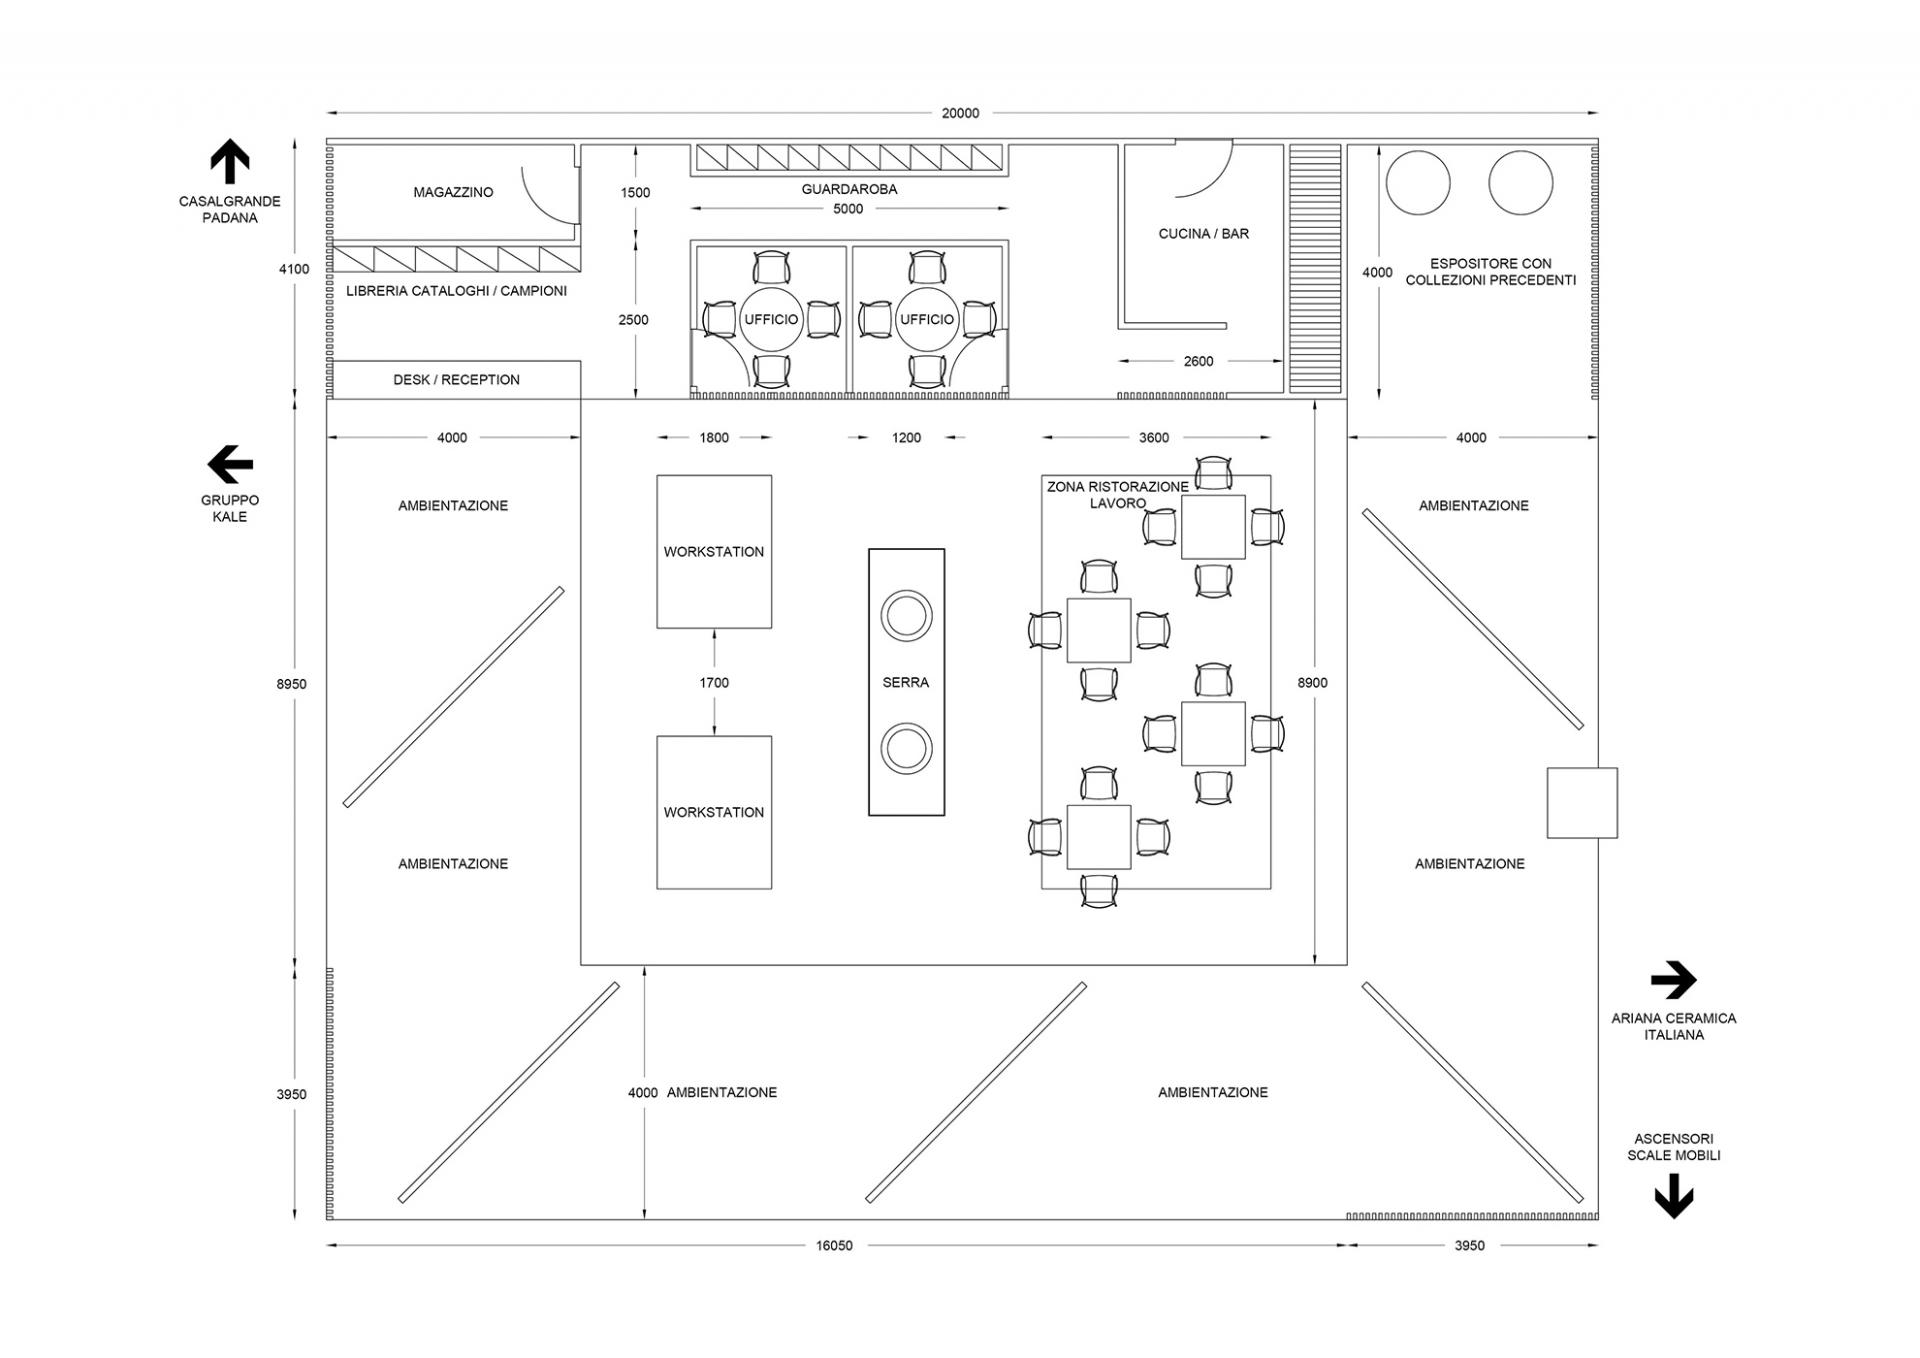 Abk ceramiche cersaie studio marco taietta for Abk interno 09